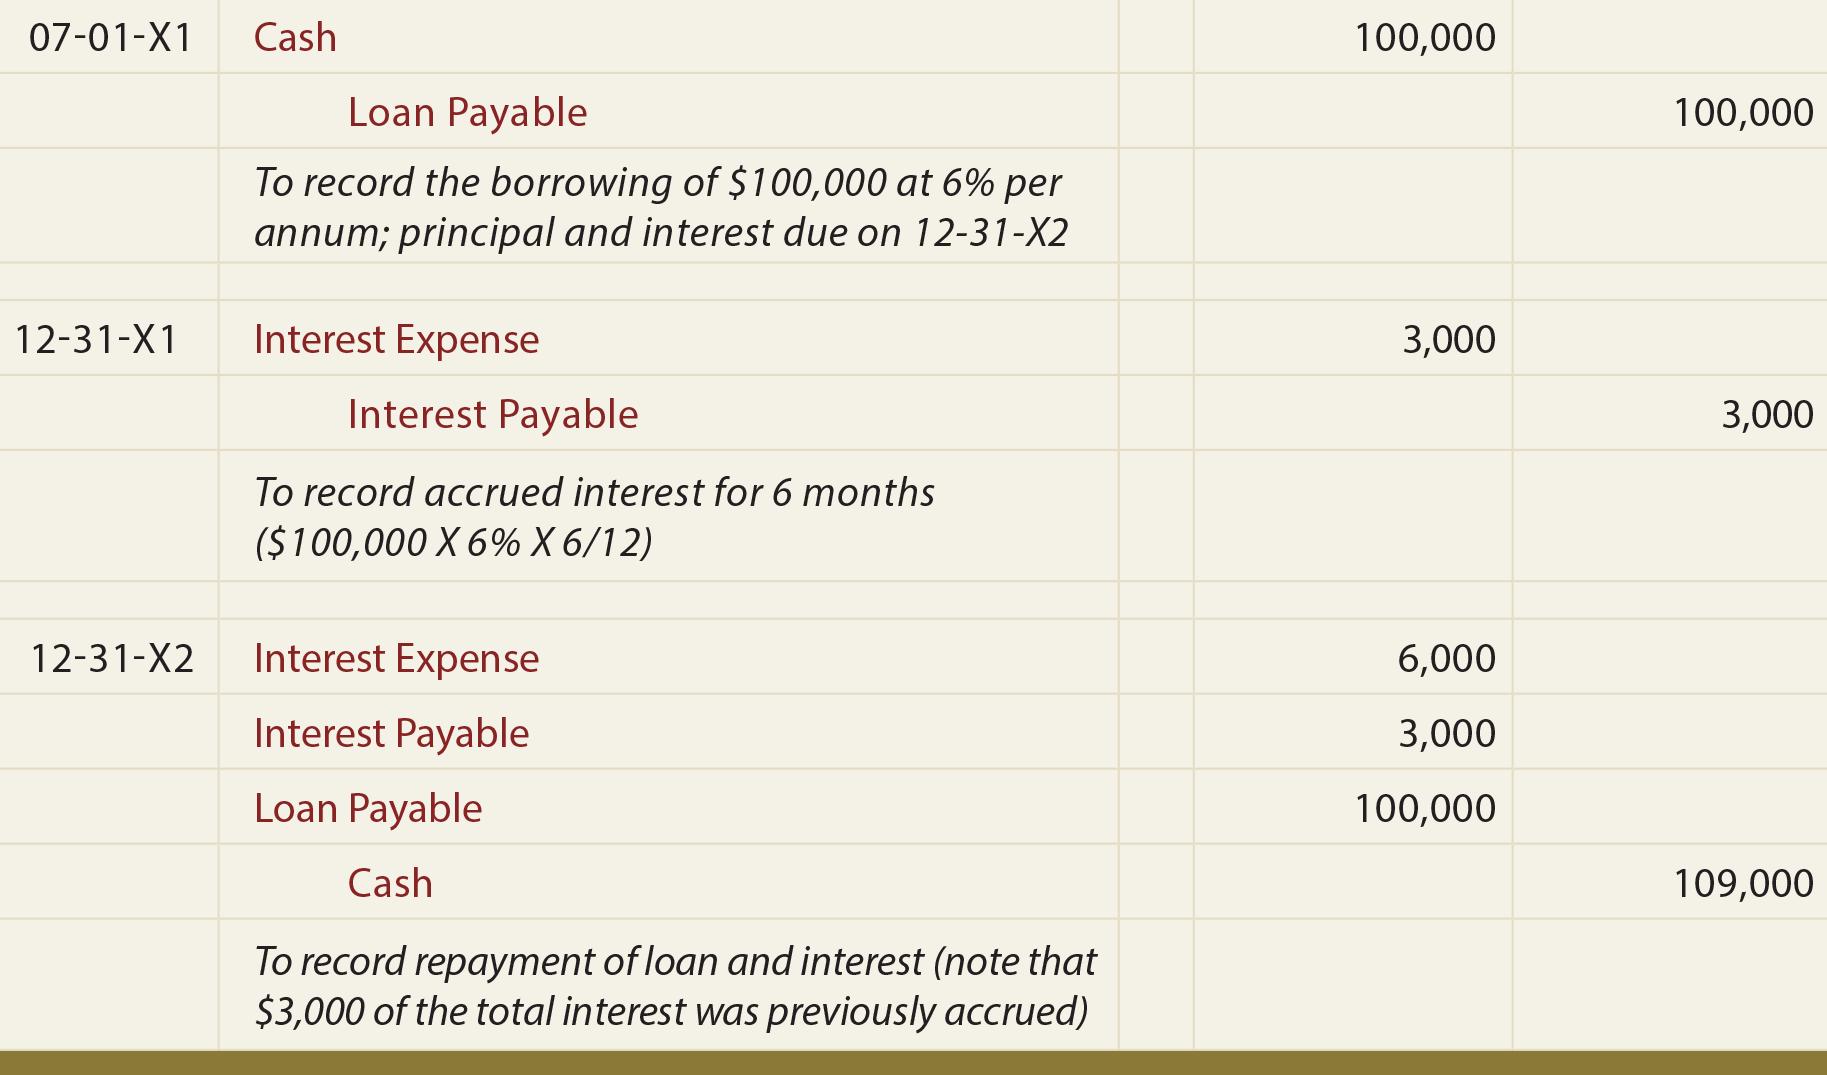 Loan Note Payable Borrow Accrued Interest And Repay